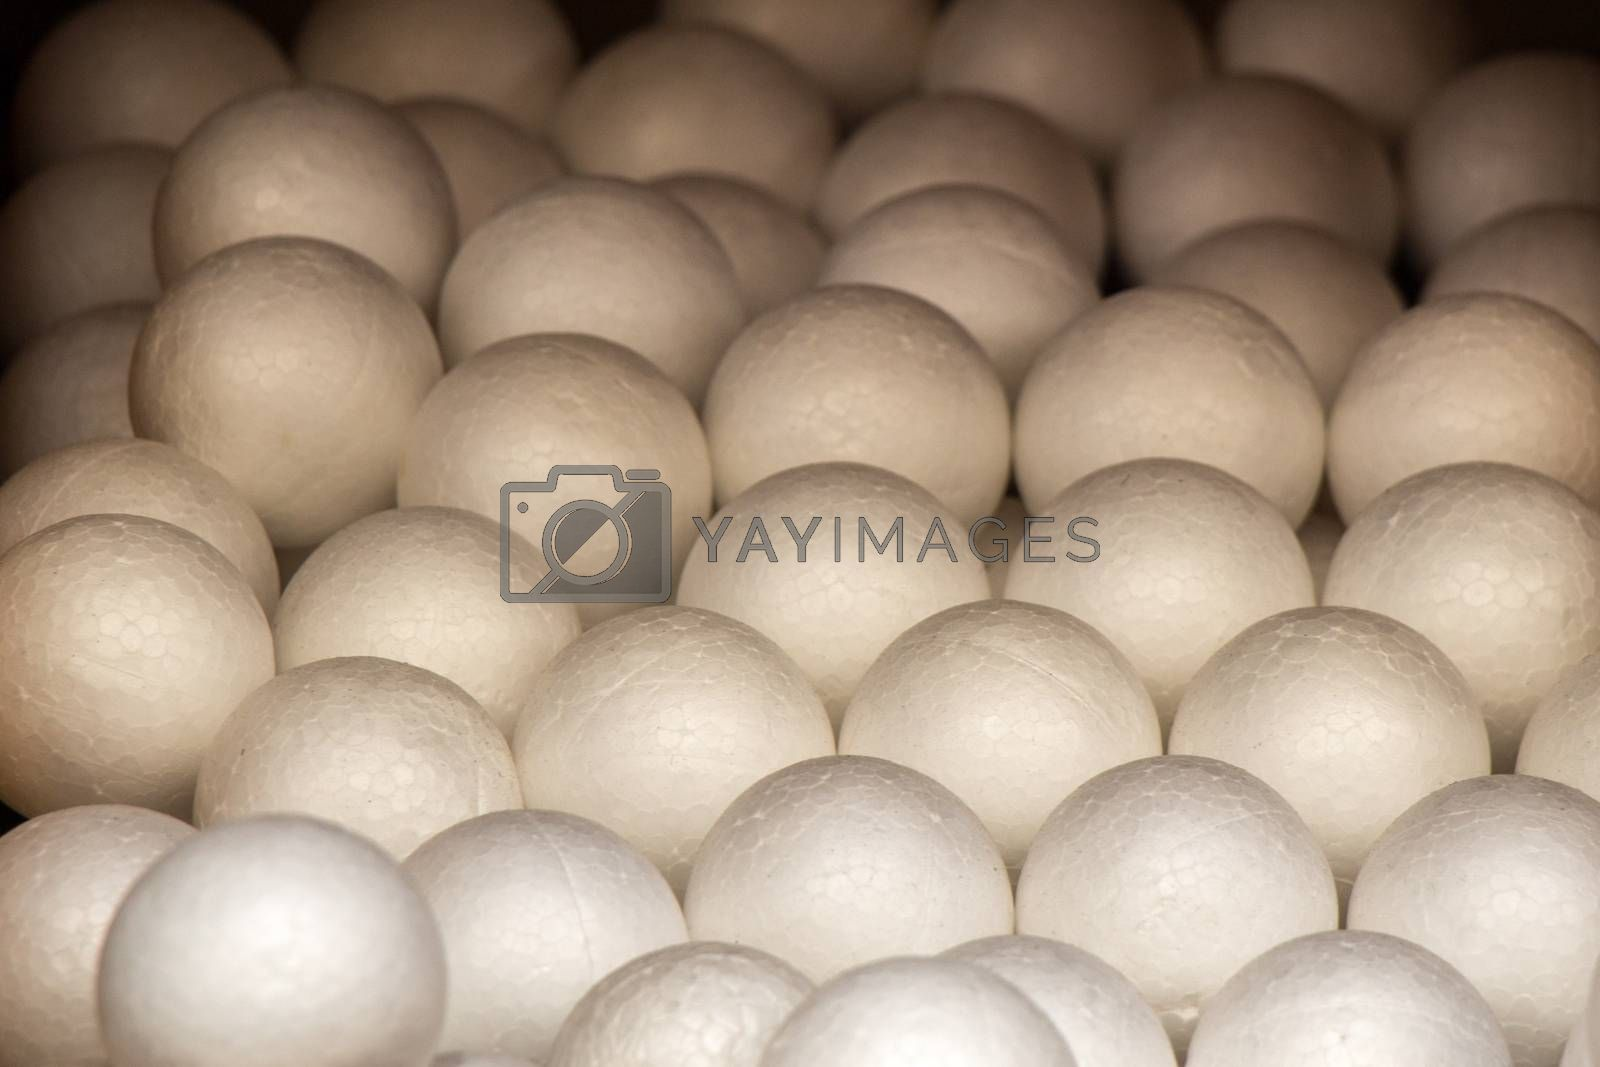 Dozens of styrofoam balls in the view